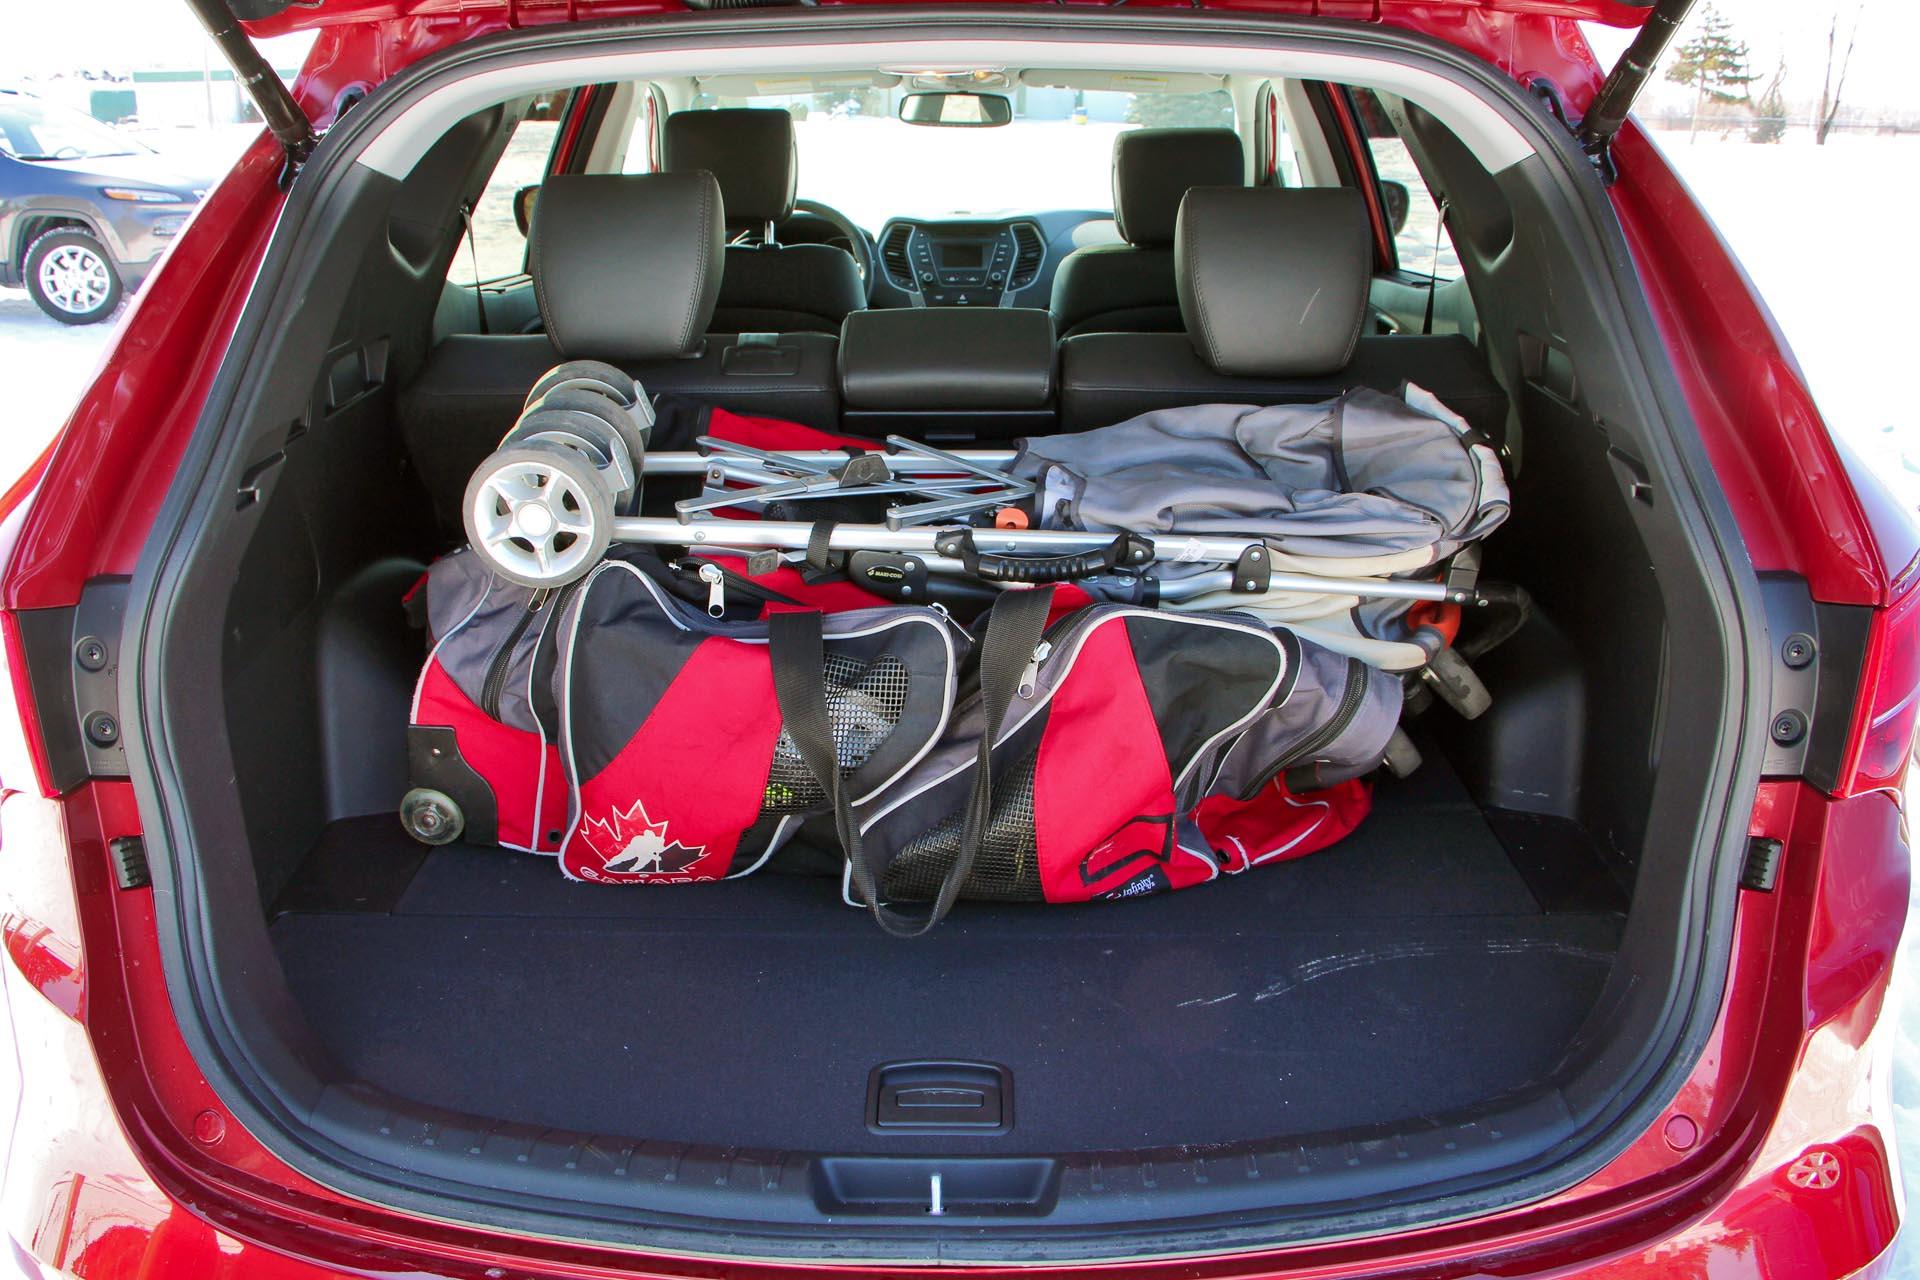 2015 hyundai santa fe sport luxury for Hyundai santa fe sport interior dimensions